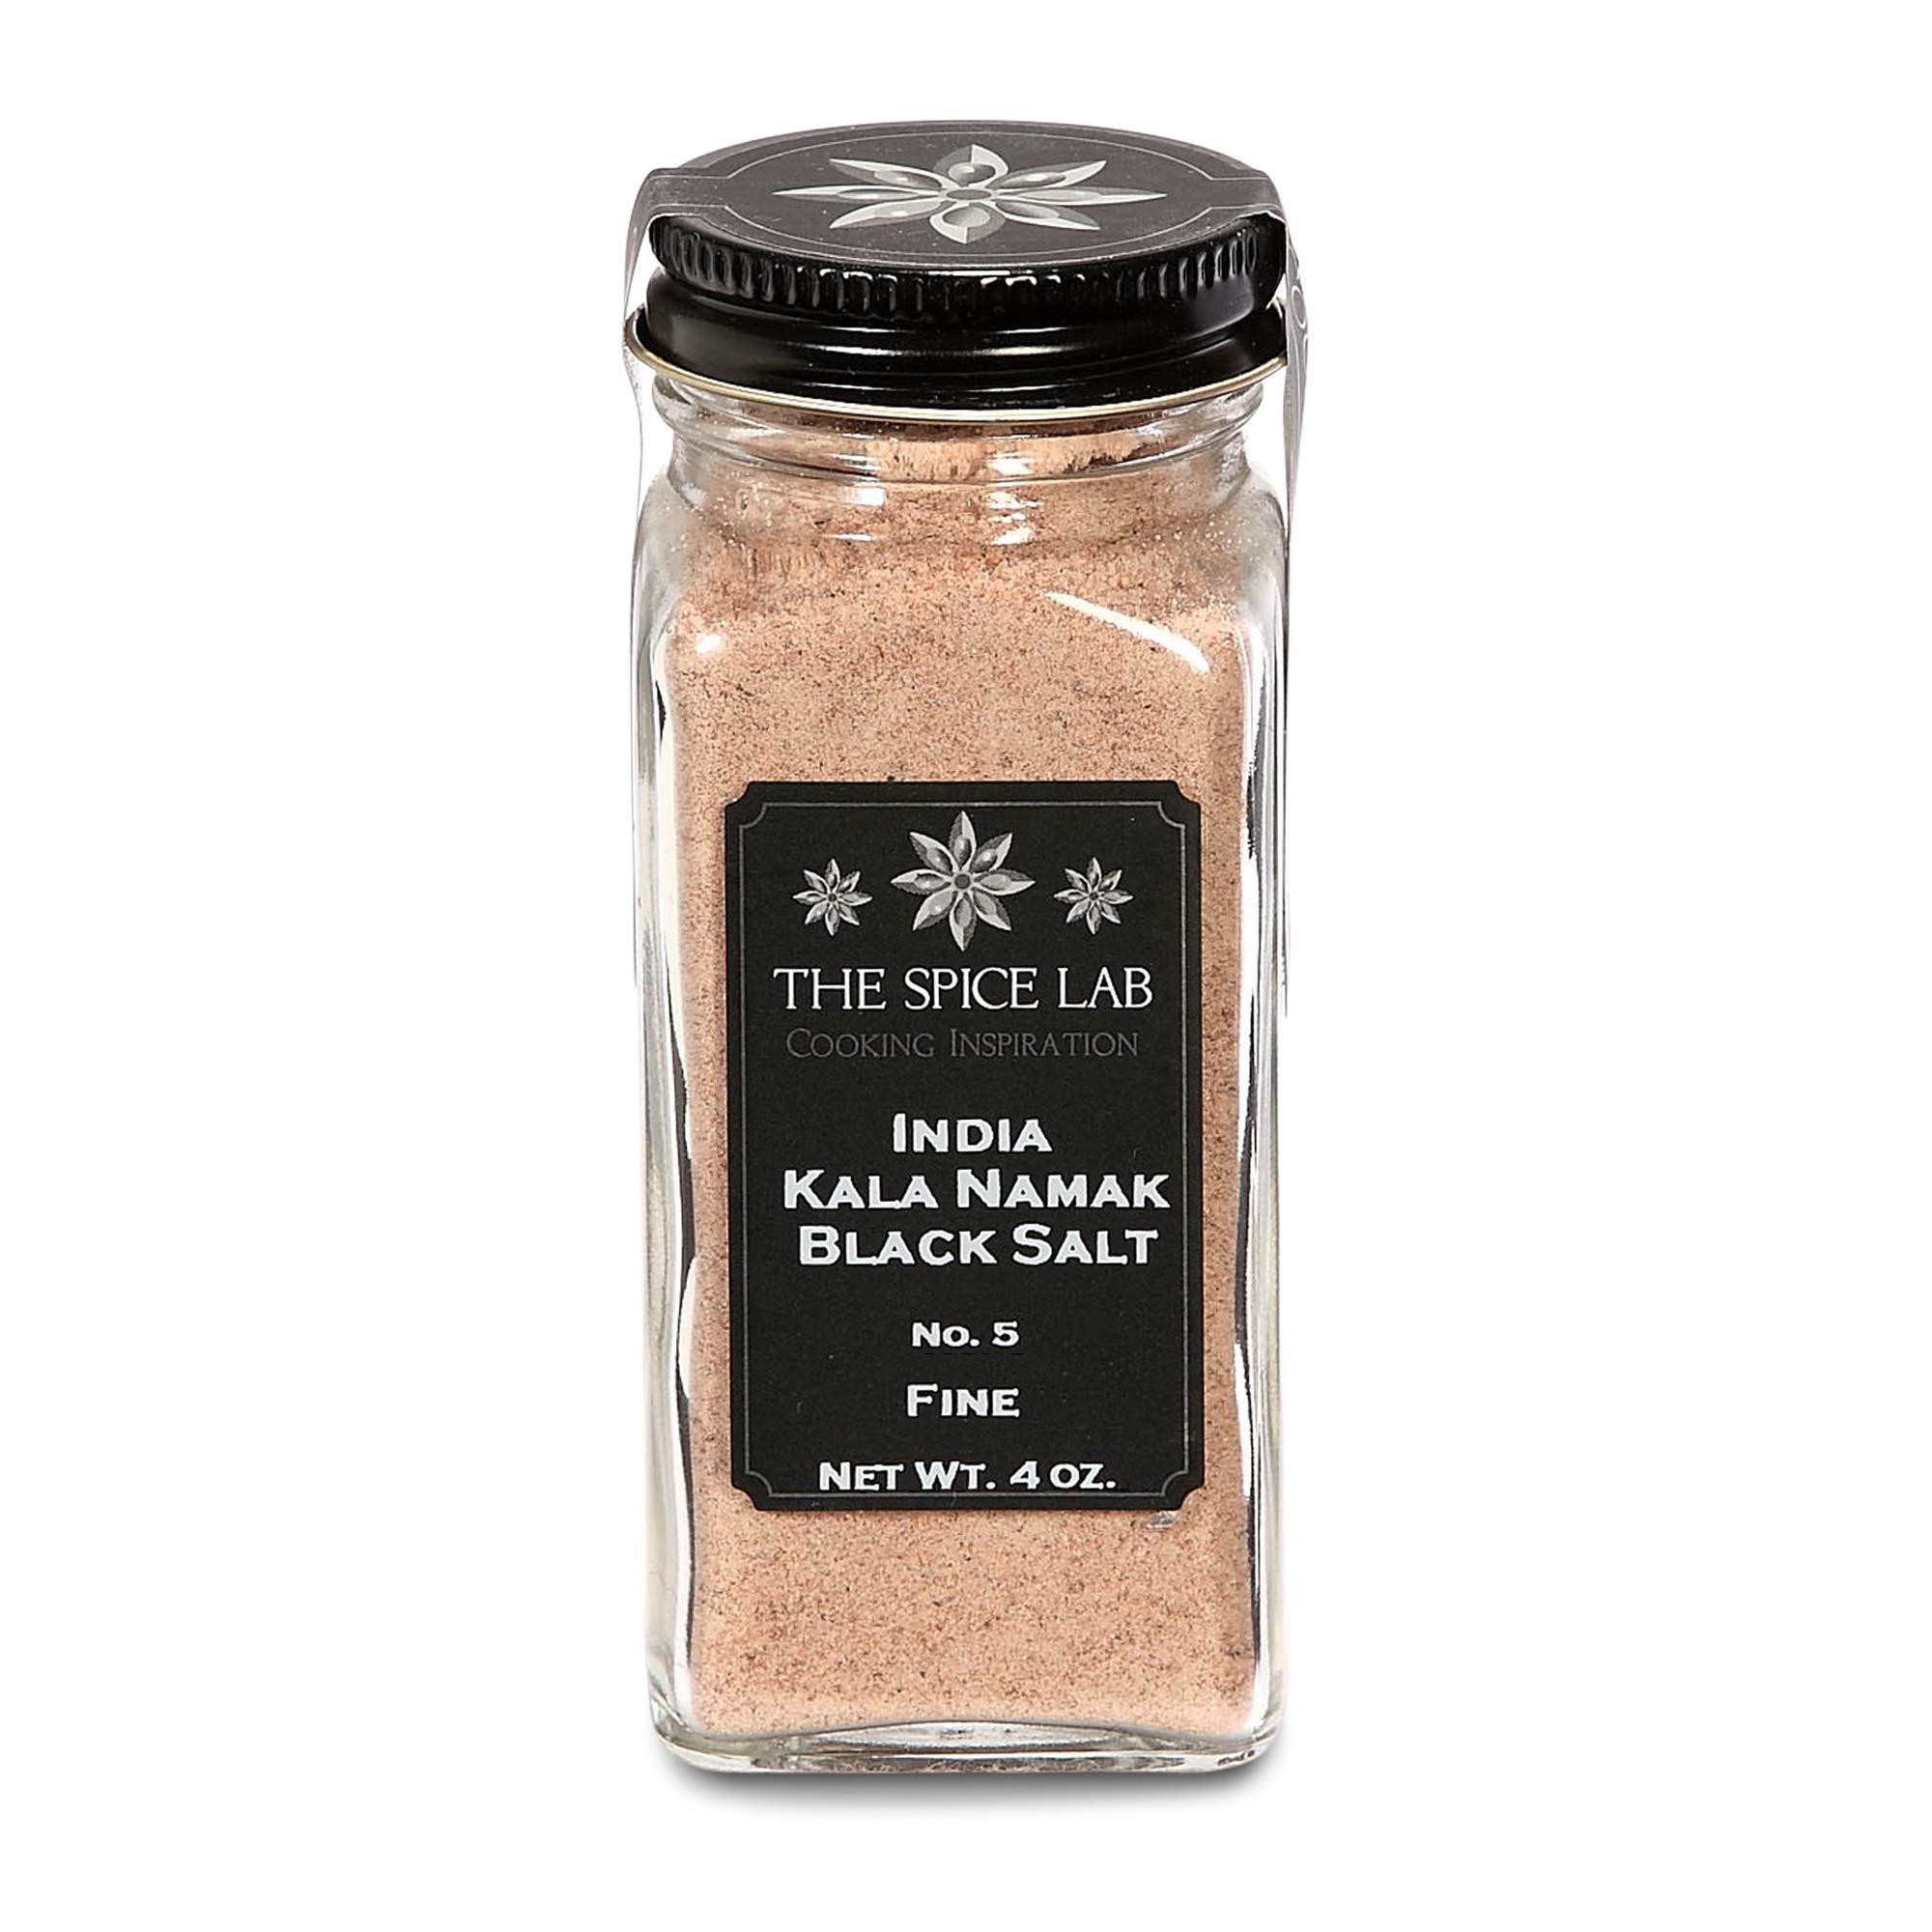 The Spice Lab (French Jar) Indian Kala Namak Mineral Salt - Himalayan Black Salt - Vegan kala namak salt Pure and Natural Indian Black Salt Gluten Free - Vegan Tofu Scrambles - Natural Egg Taste by The Spice Lab